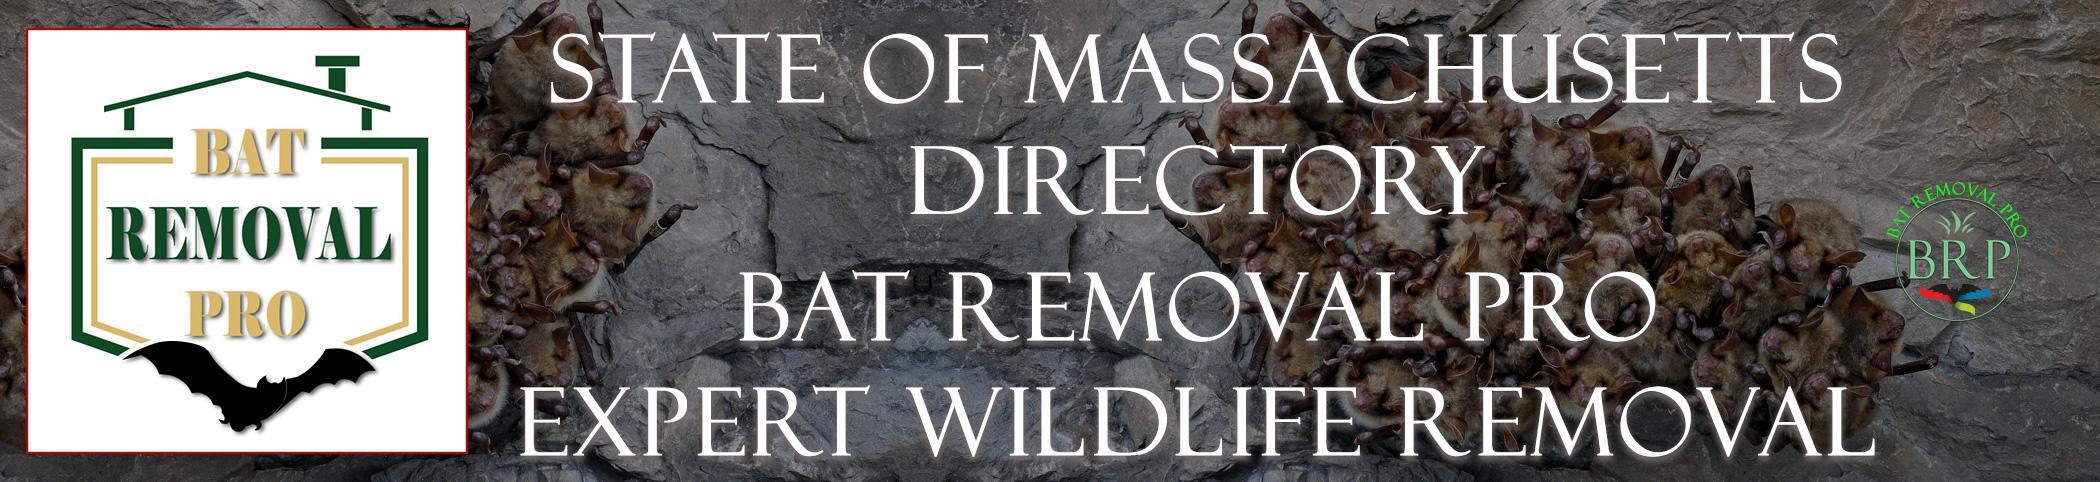 MASSACHUSETTS-bat-removal-at-bat-removal-pro-header-image